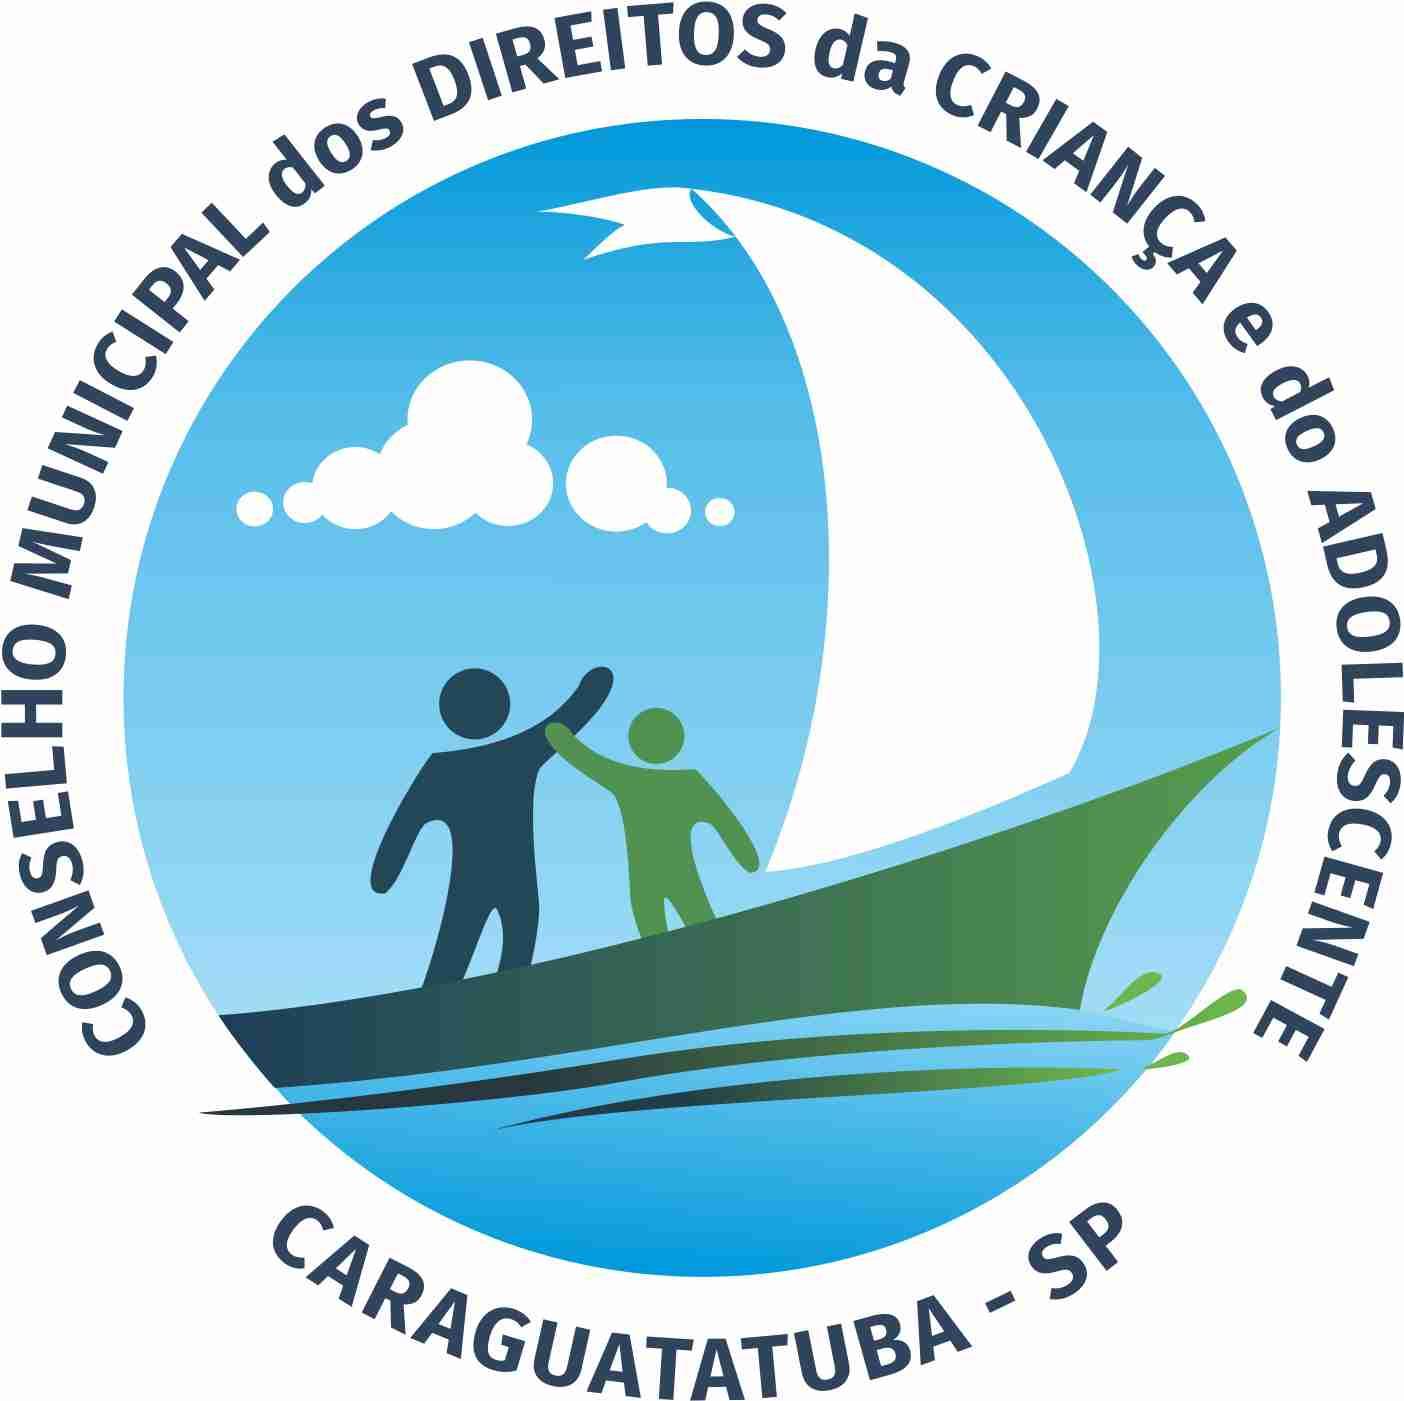 264 - logo CMDCAC